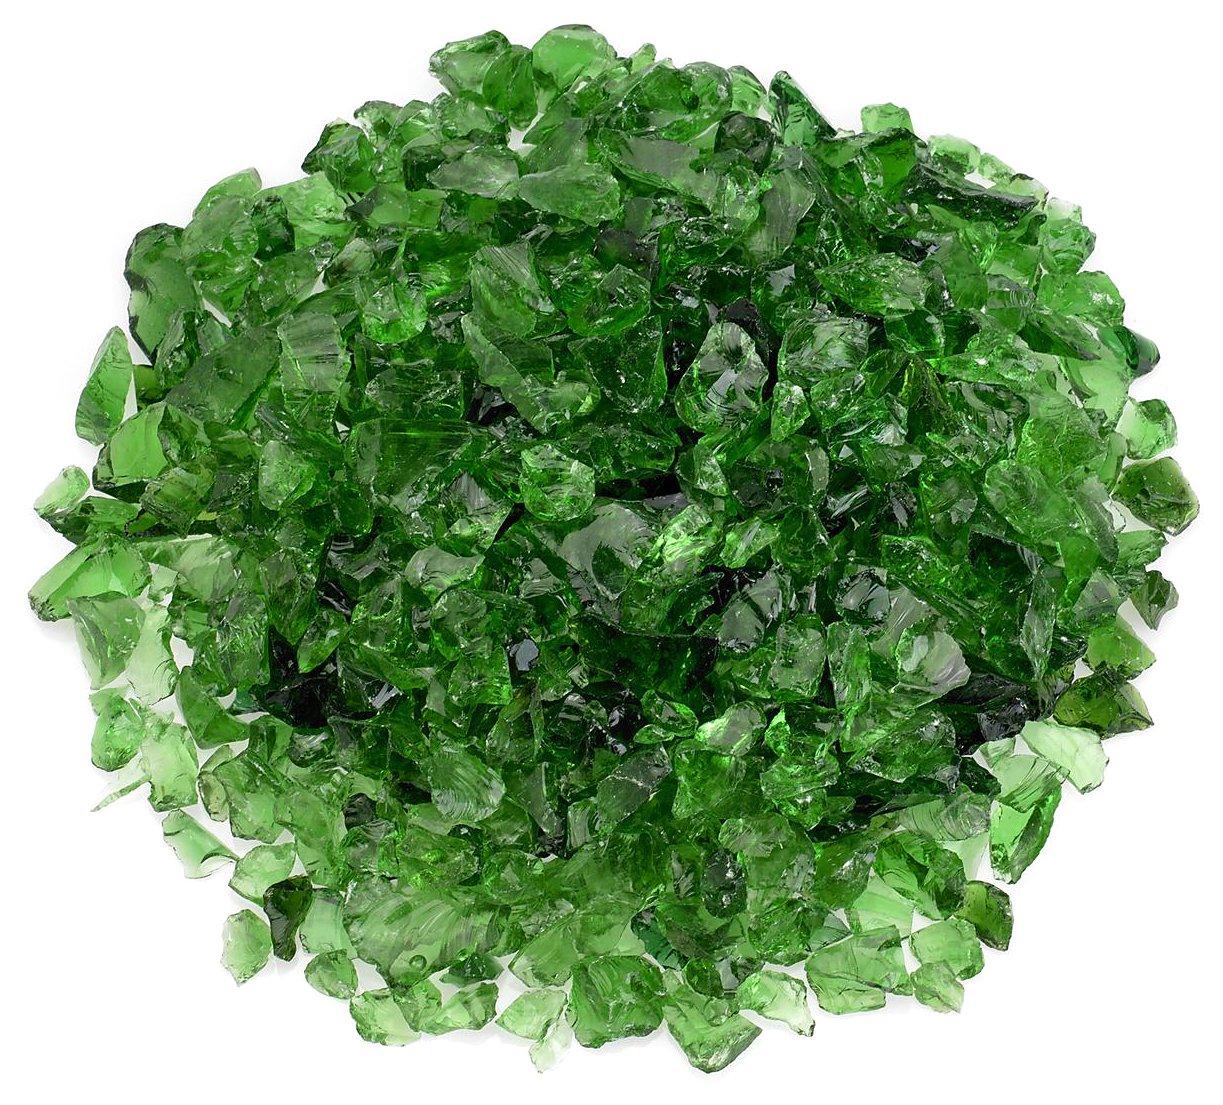 American Fireglass Light Green Recycled Fire Pit Glass - Small (12-18Mm), 55 lb. Bag